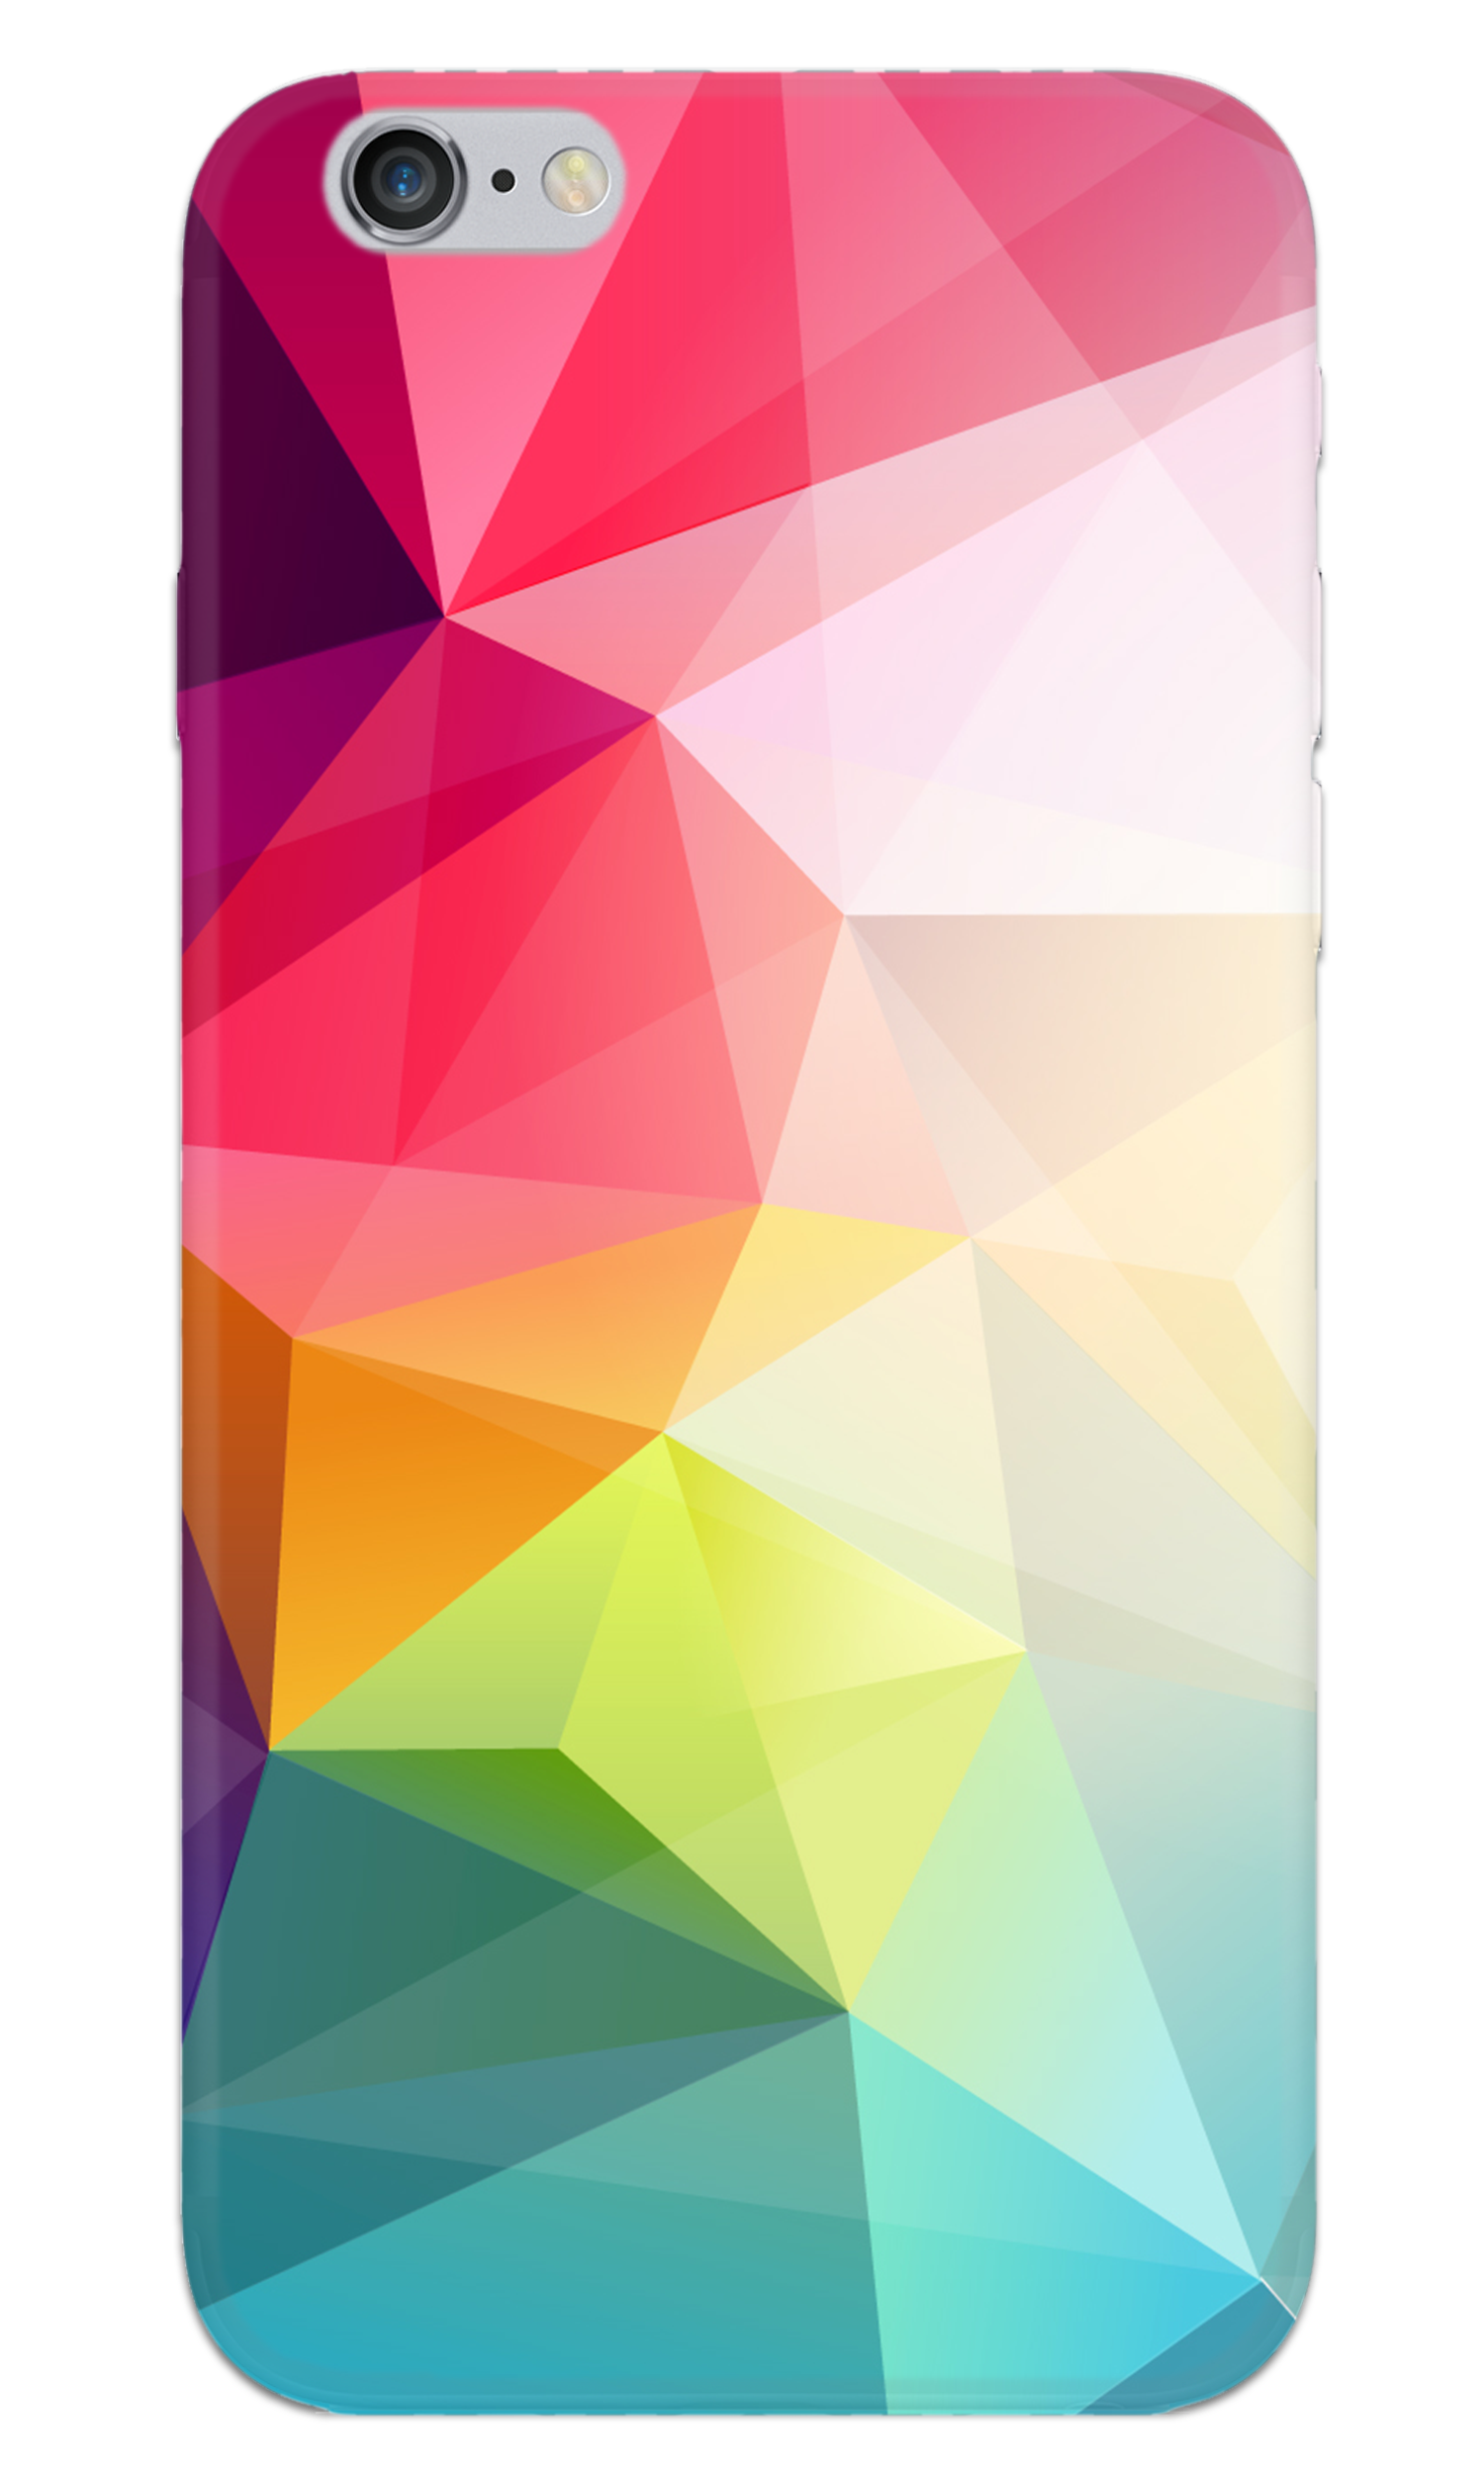 Vectores Colores - UncommonMe